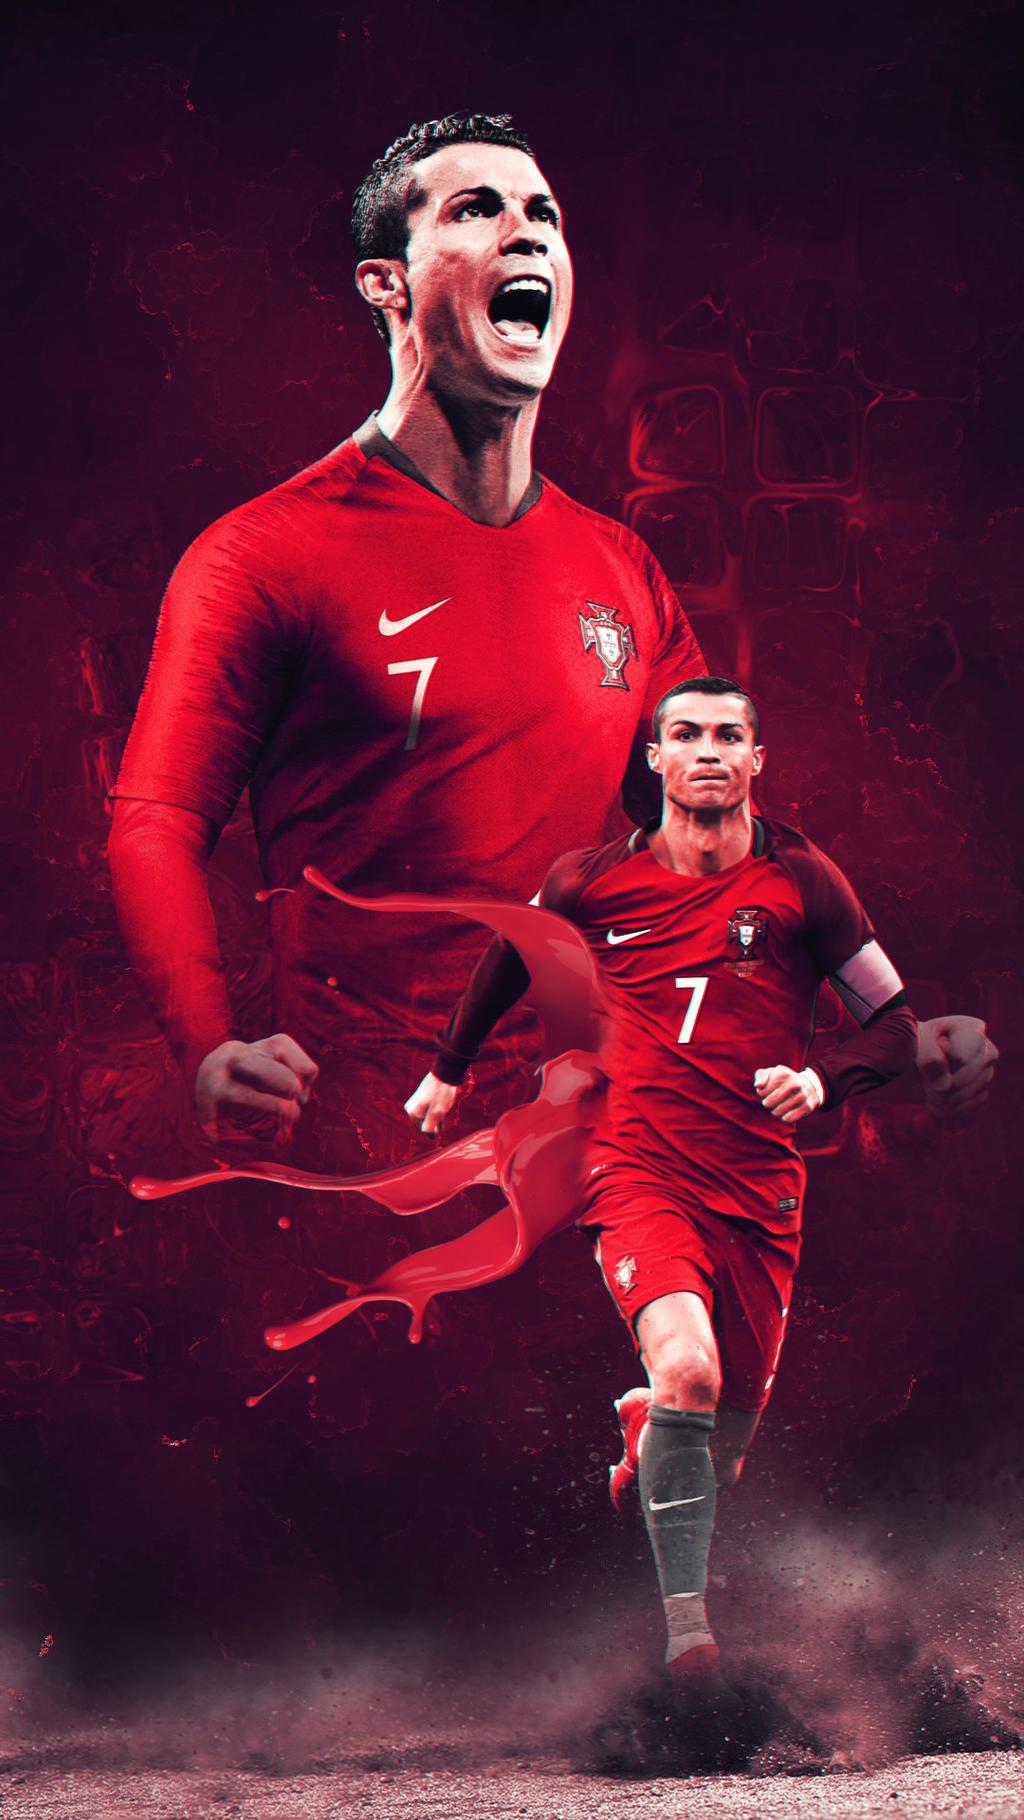 Cristiano Ronaldo - HD Wallpaper by Achu17 on DeviantArt